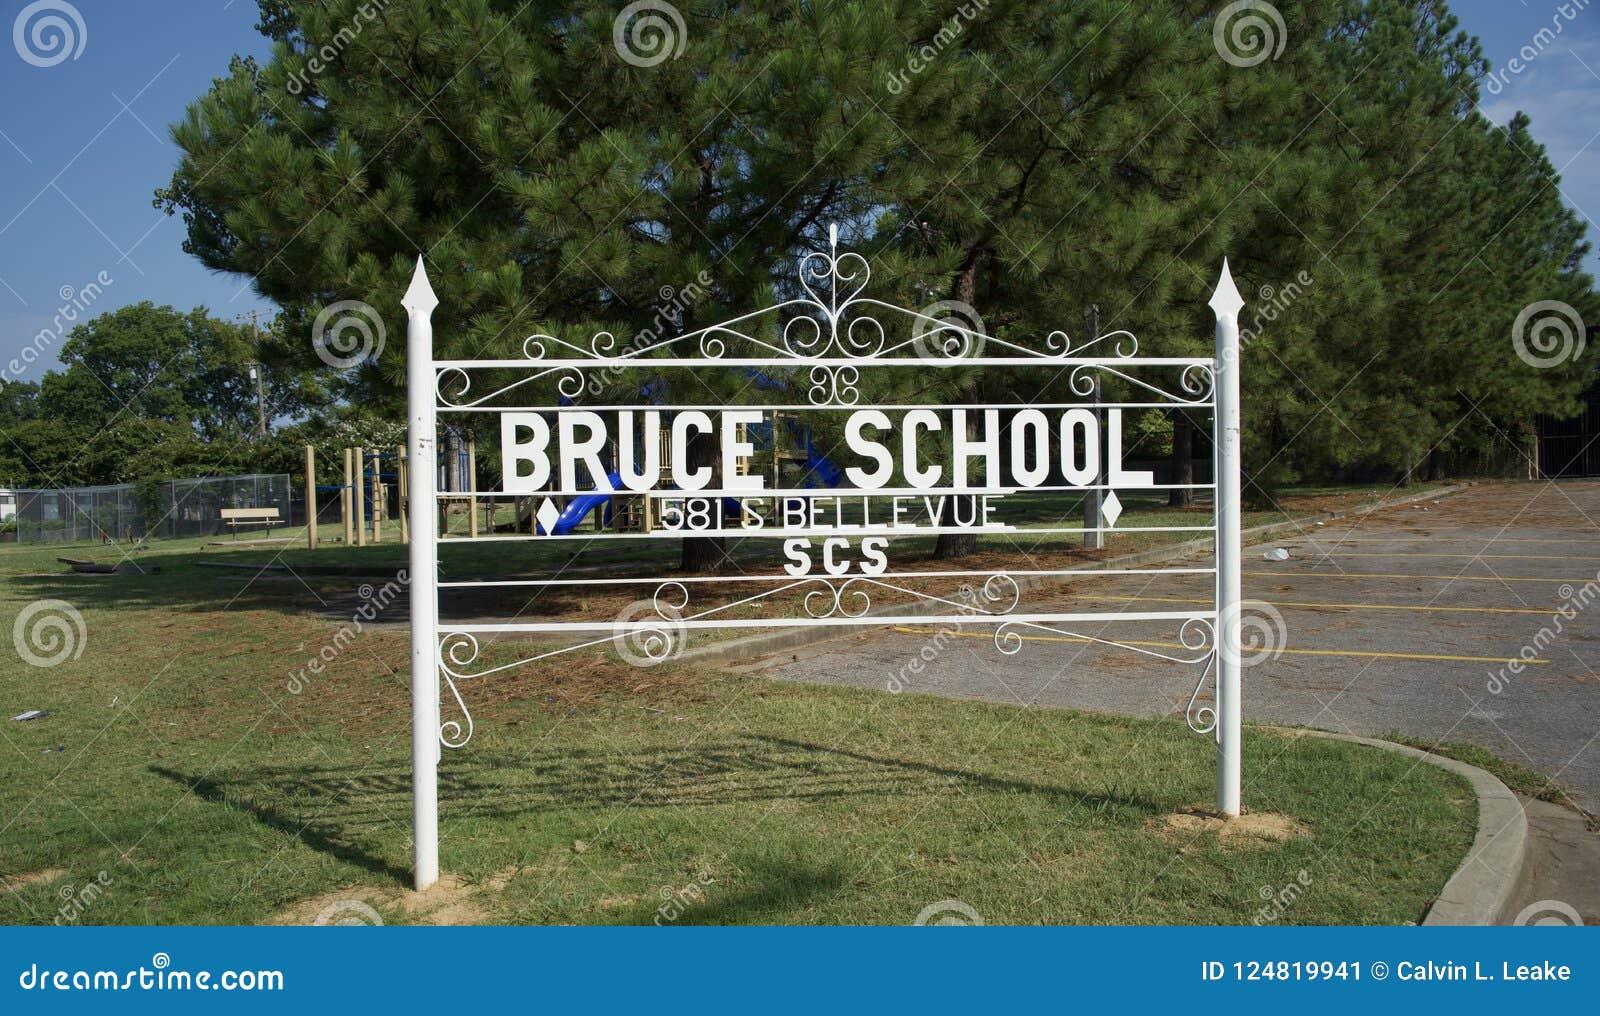 Bruce Elementary School Yard Sign Memphis, Tennessee